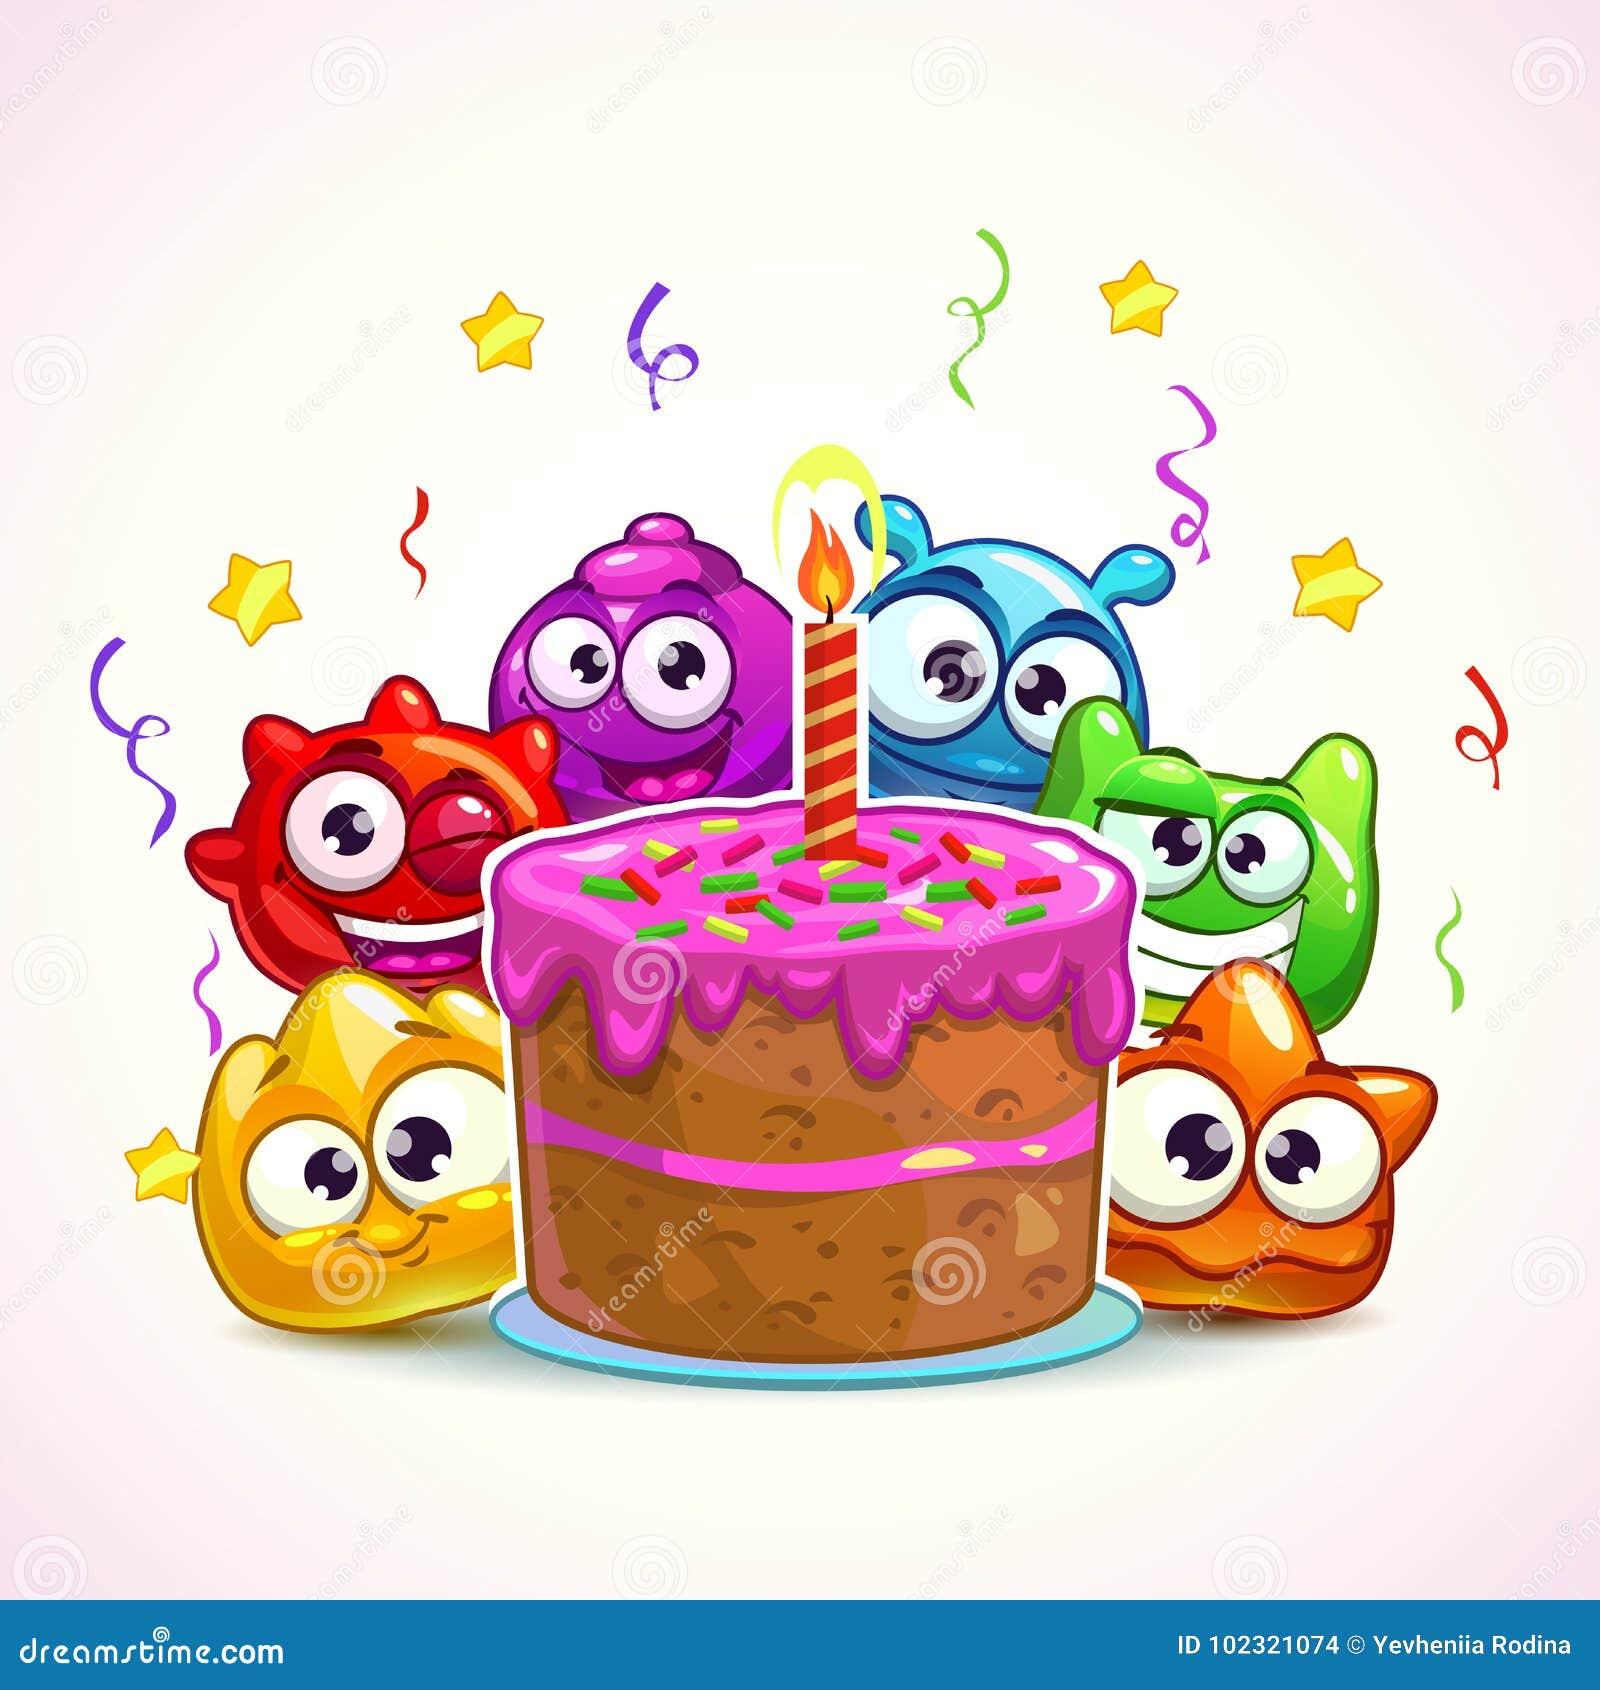 Astonishing Funny Birthday Illustration Stock Vector Illustration Of Friend Funny Birthday Cards Online Barepcheapnameinfo